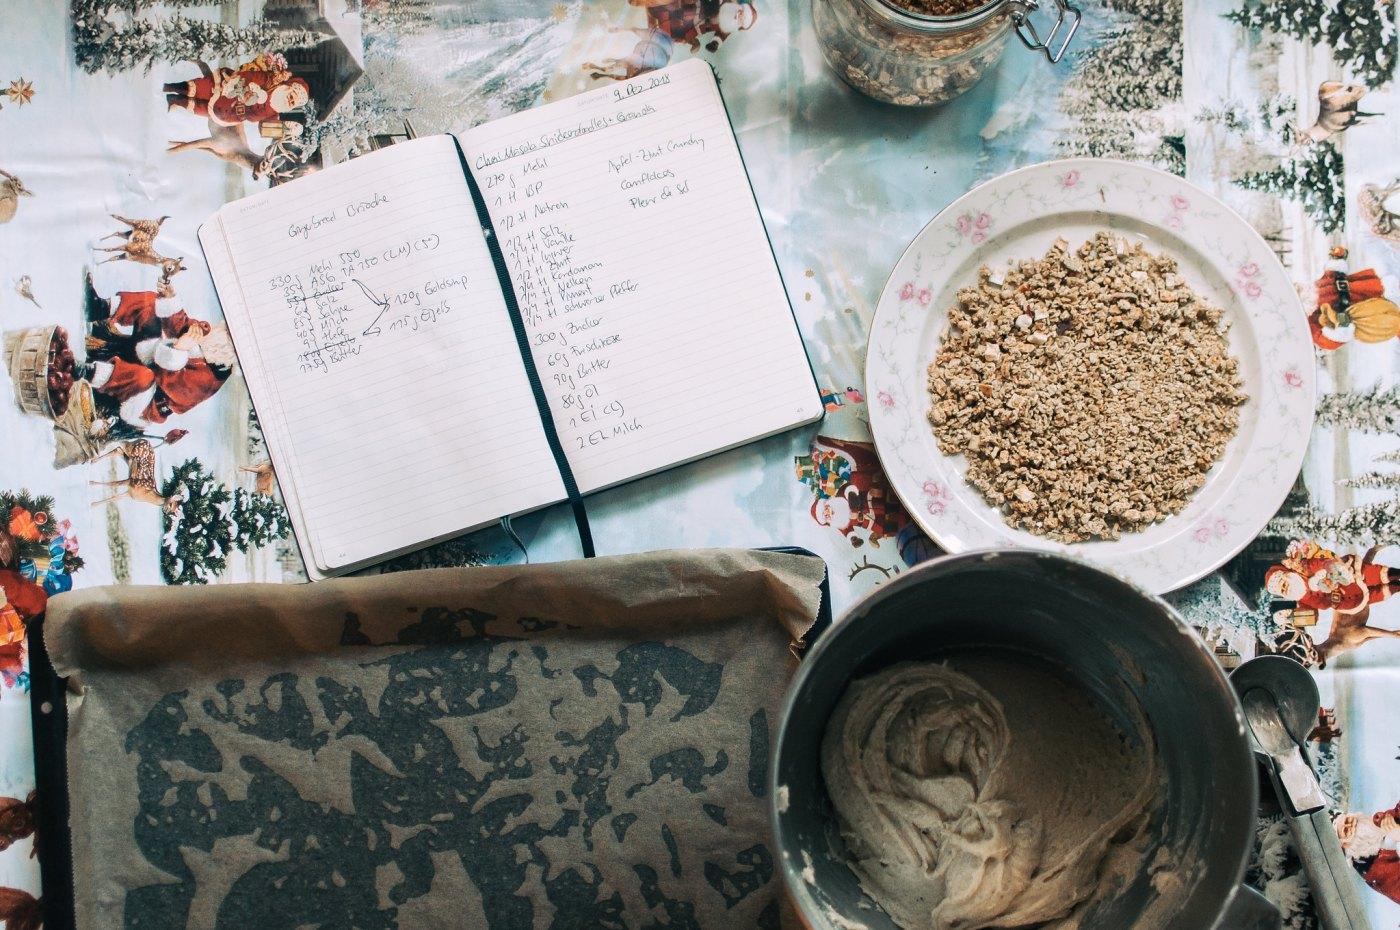 chai masala snickerdoodles with apple spice granola